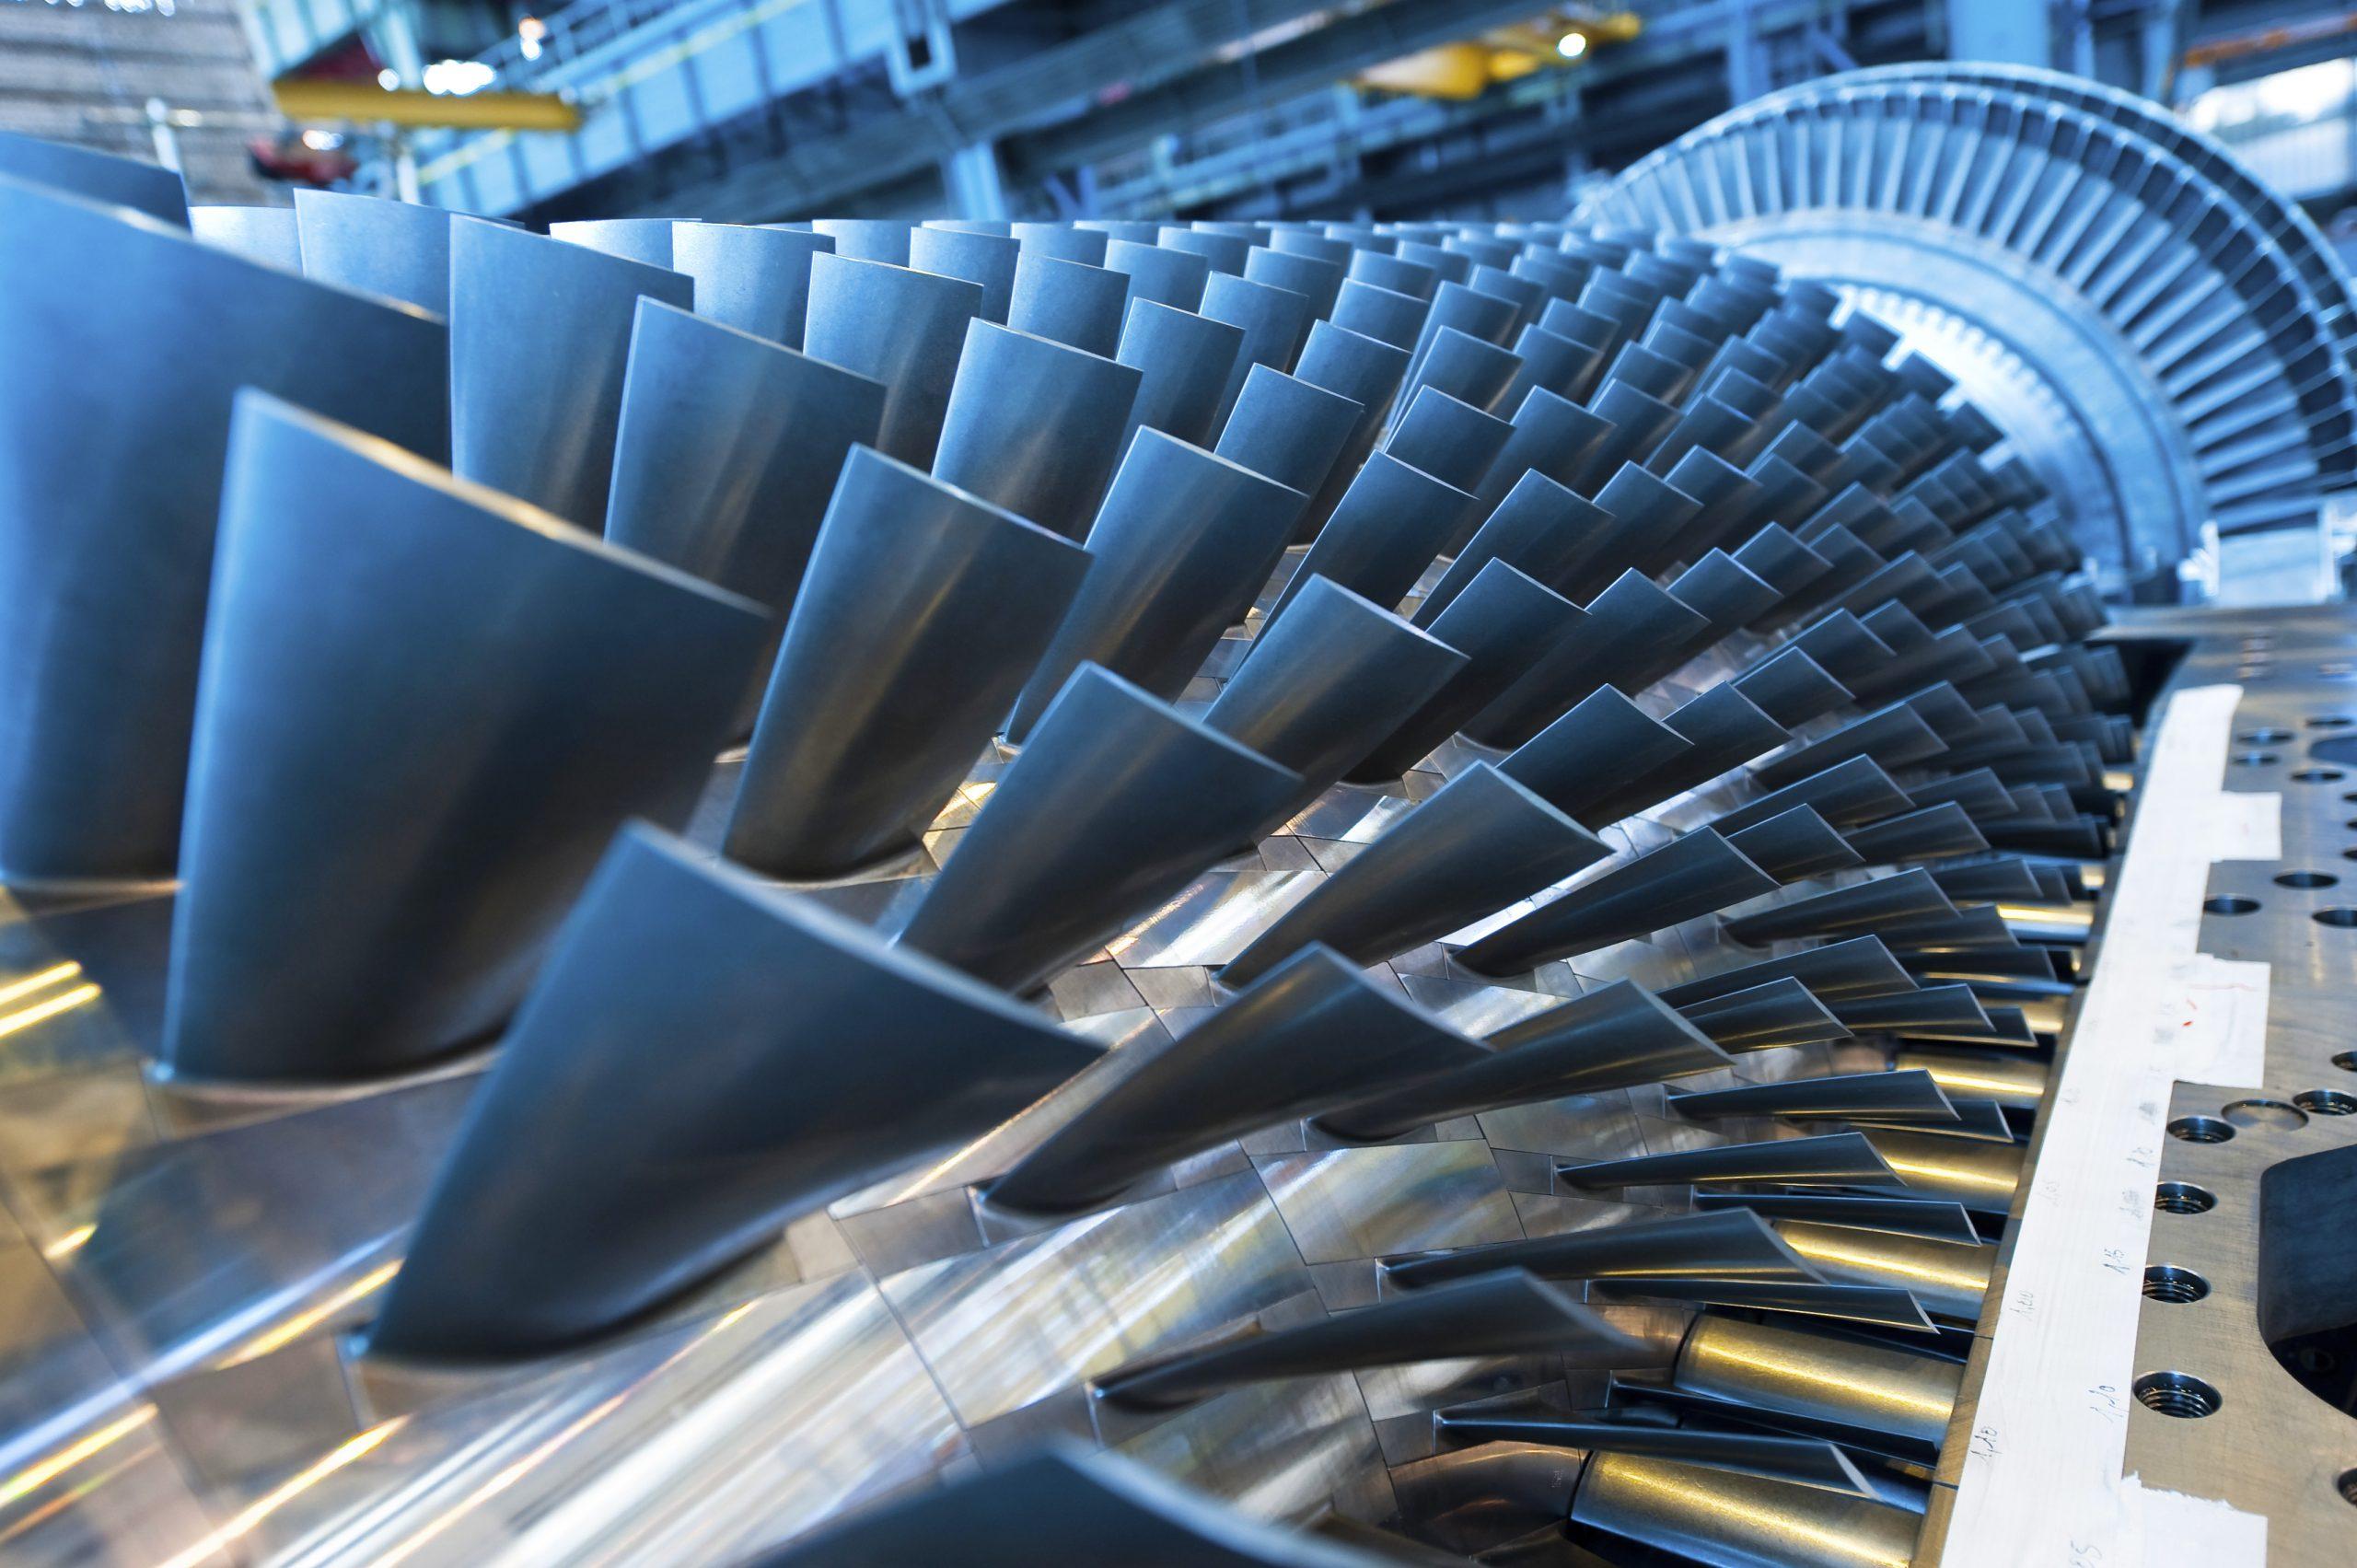 PSP31031-088, 6B Gas Turbine, 6B Rotor- compressor section, Belfort, France, Europe, DI-2800x4200